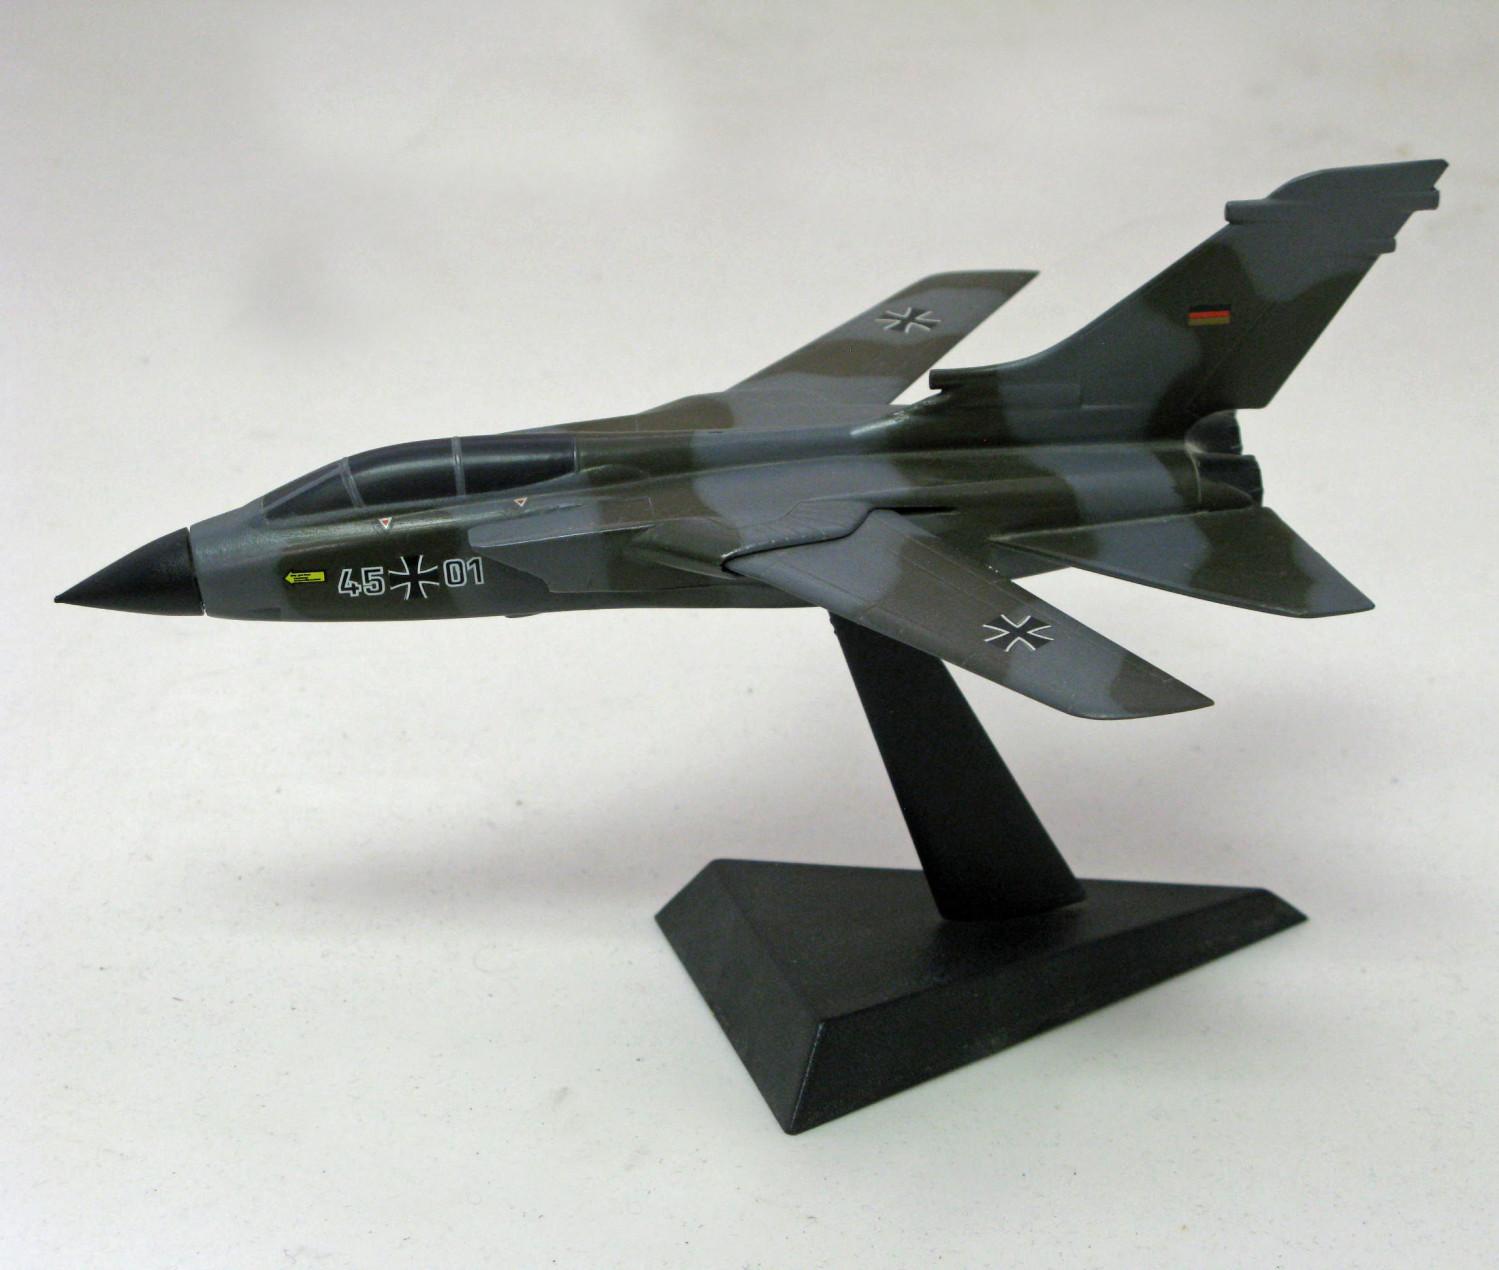 Model  of Panavia MRCA/Tornado